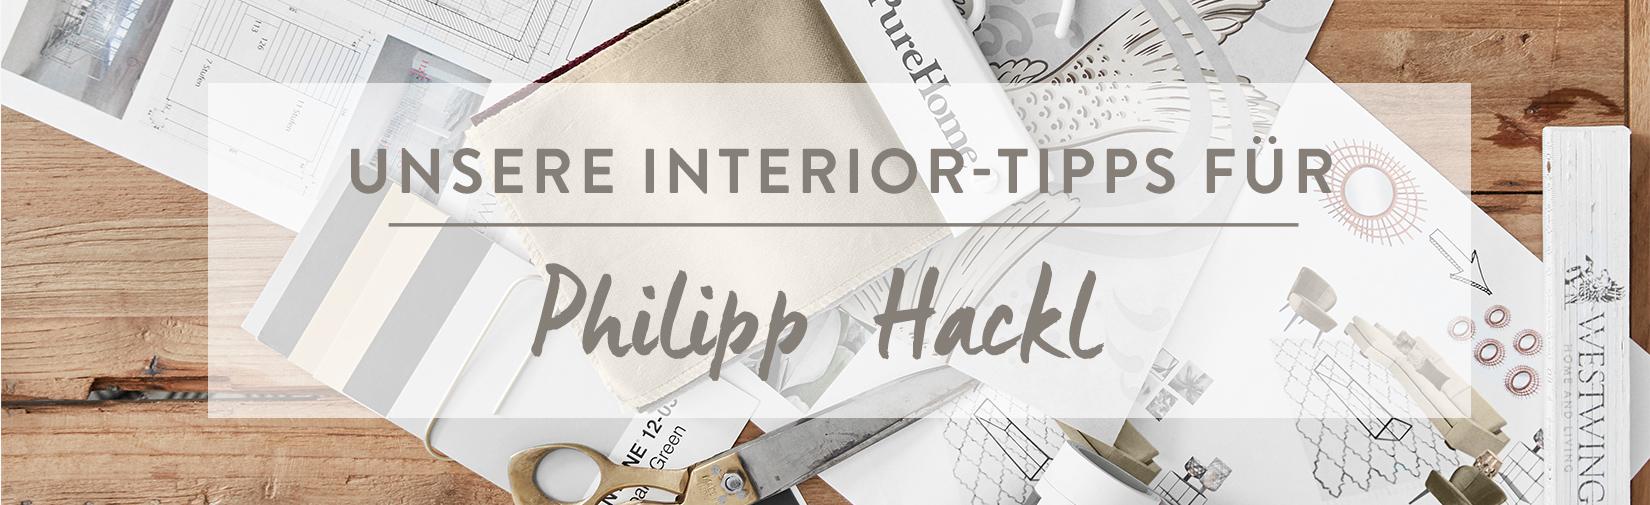 Philipp_Hackl_Desktop